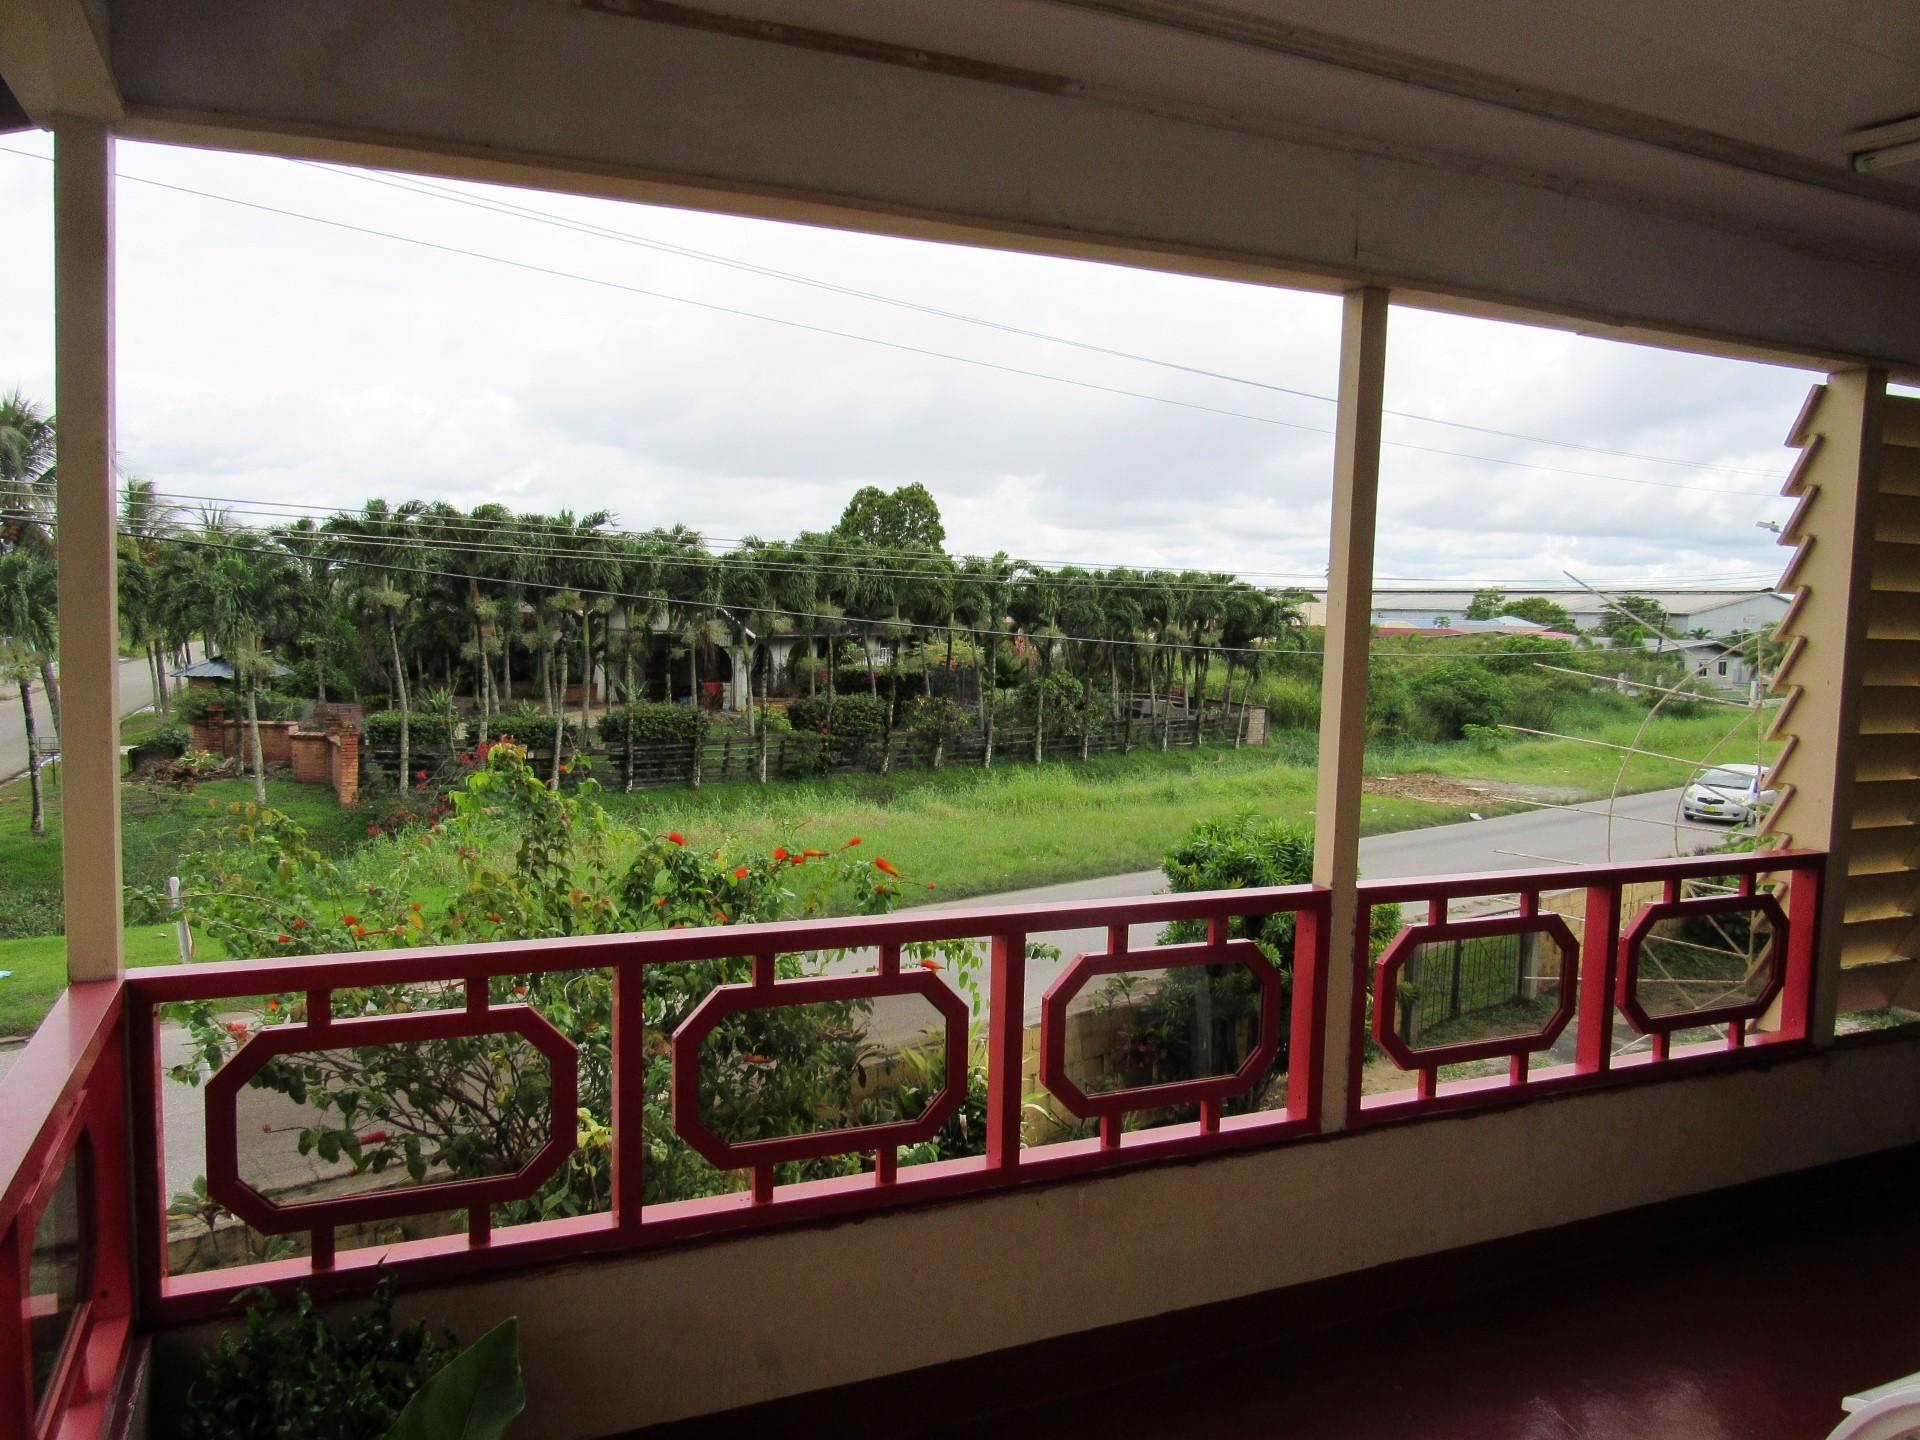 Henkielaan-32-Koopwoning-Terzol-Vastgoed-Paramaribo-Suriname-25